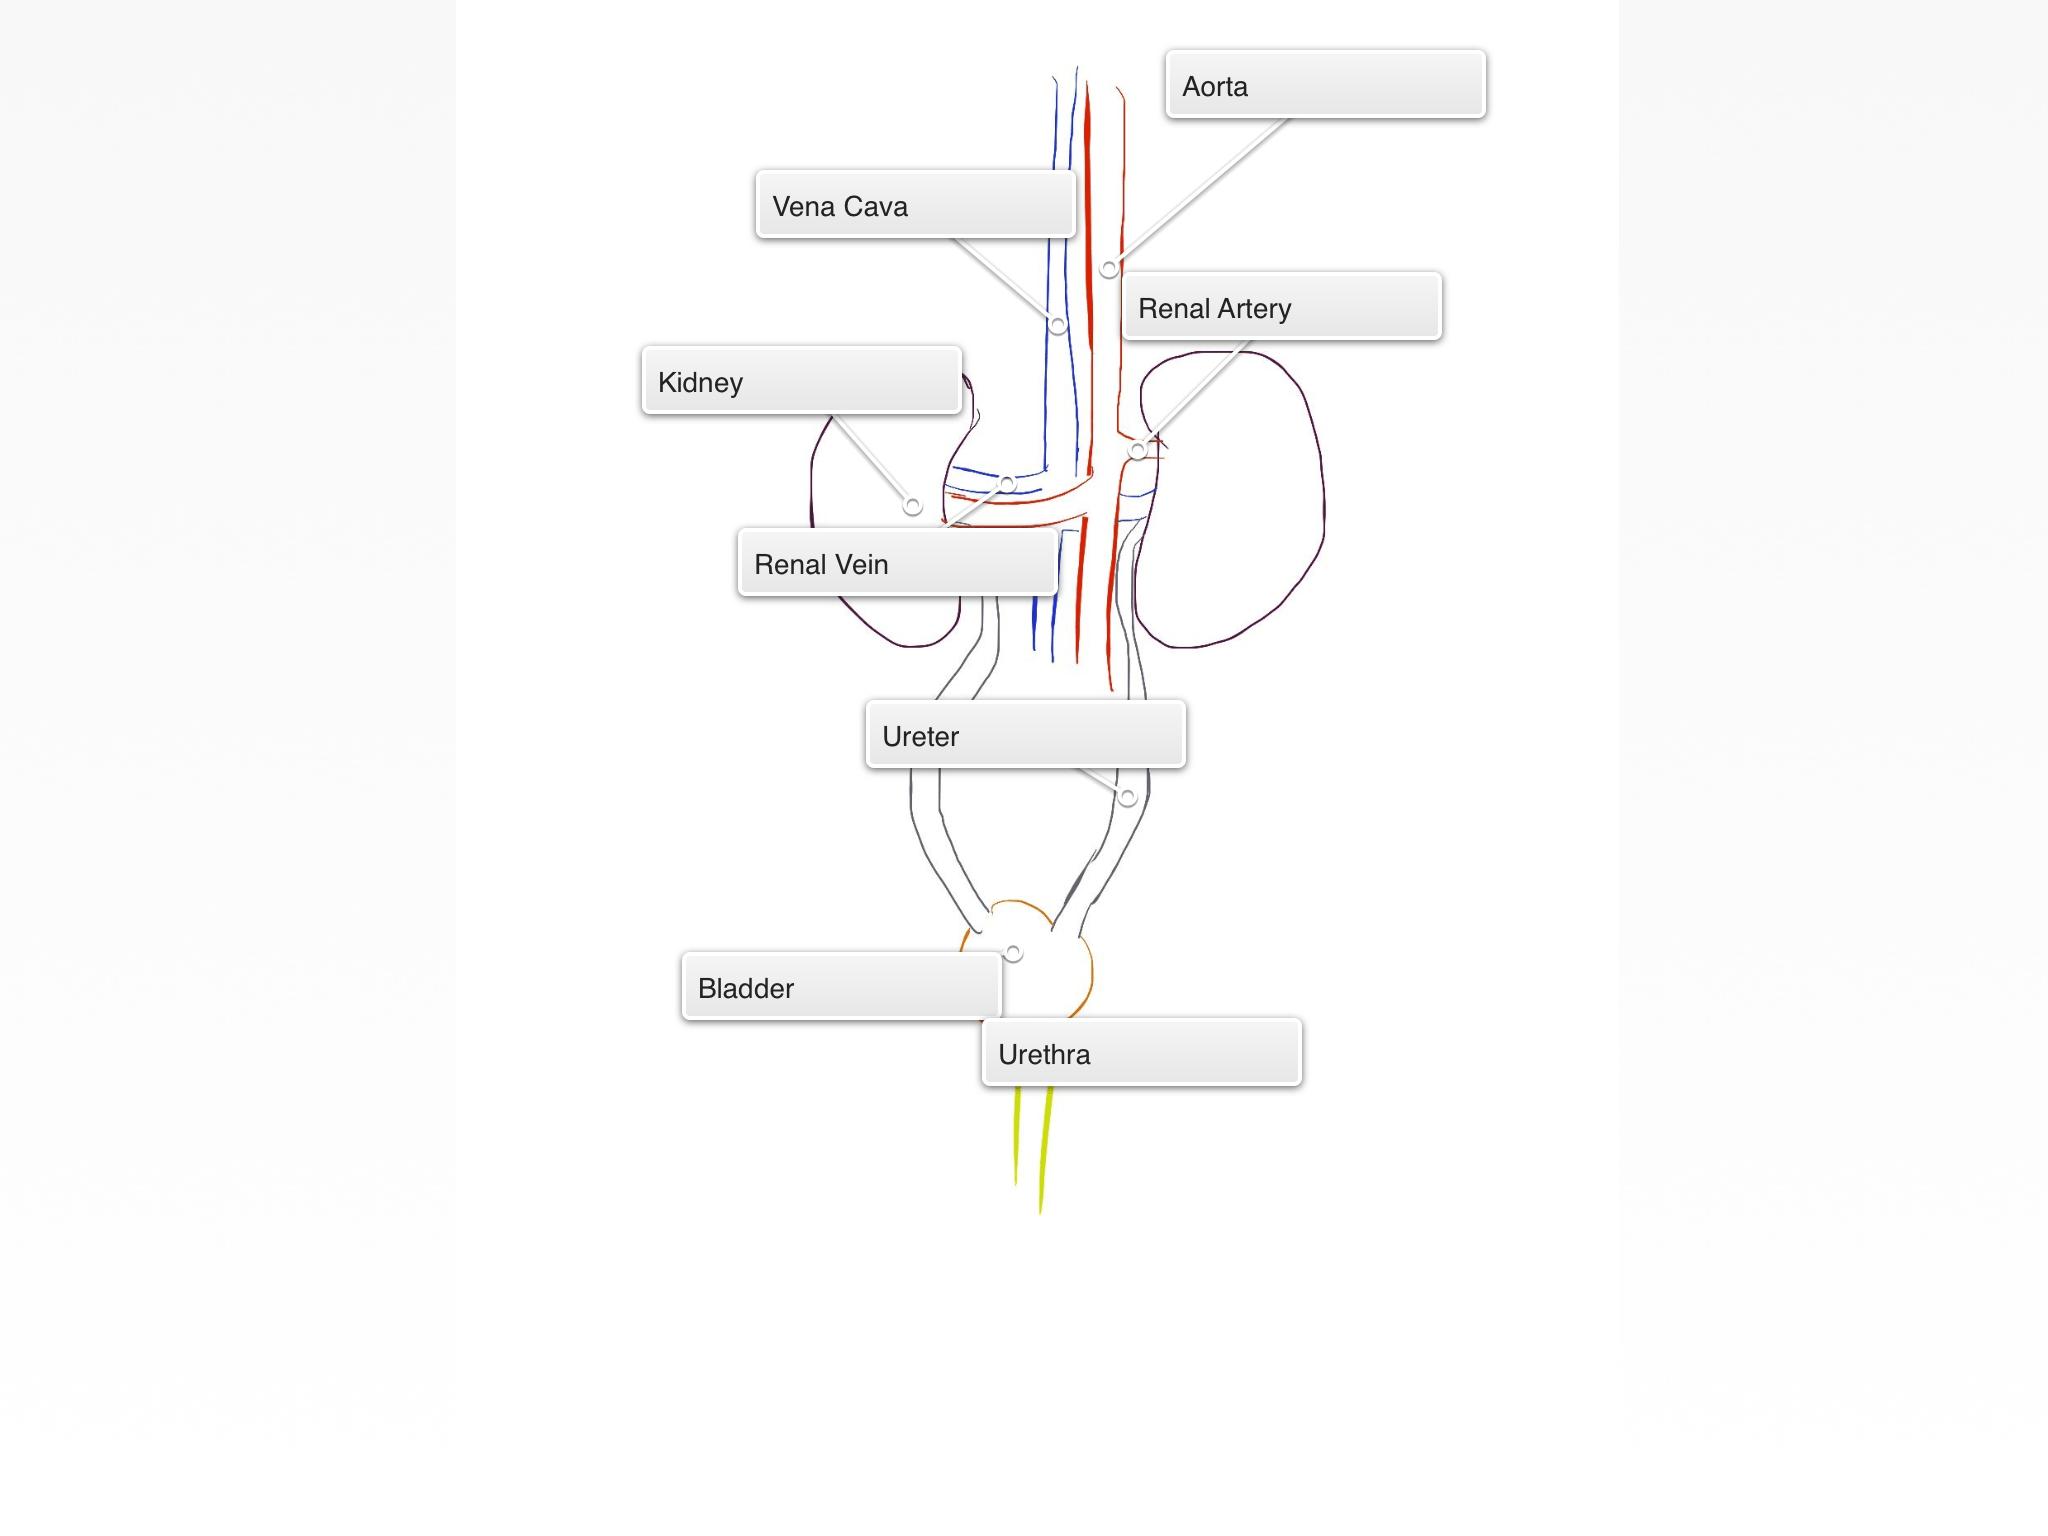 excretory system diagram labeled dodge durango radio wiring human